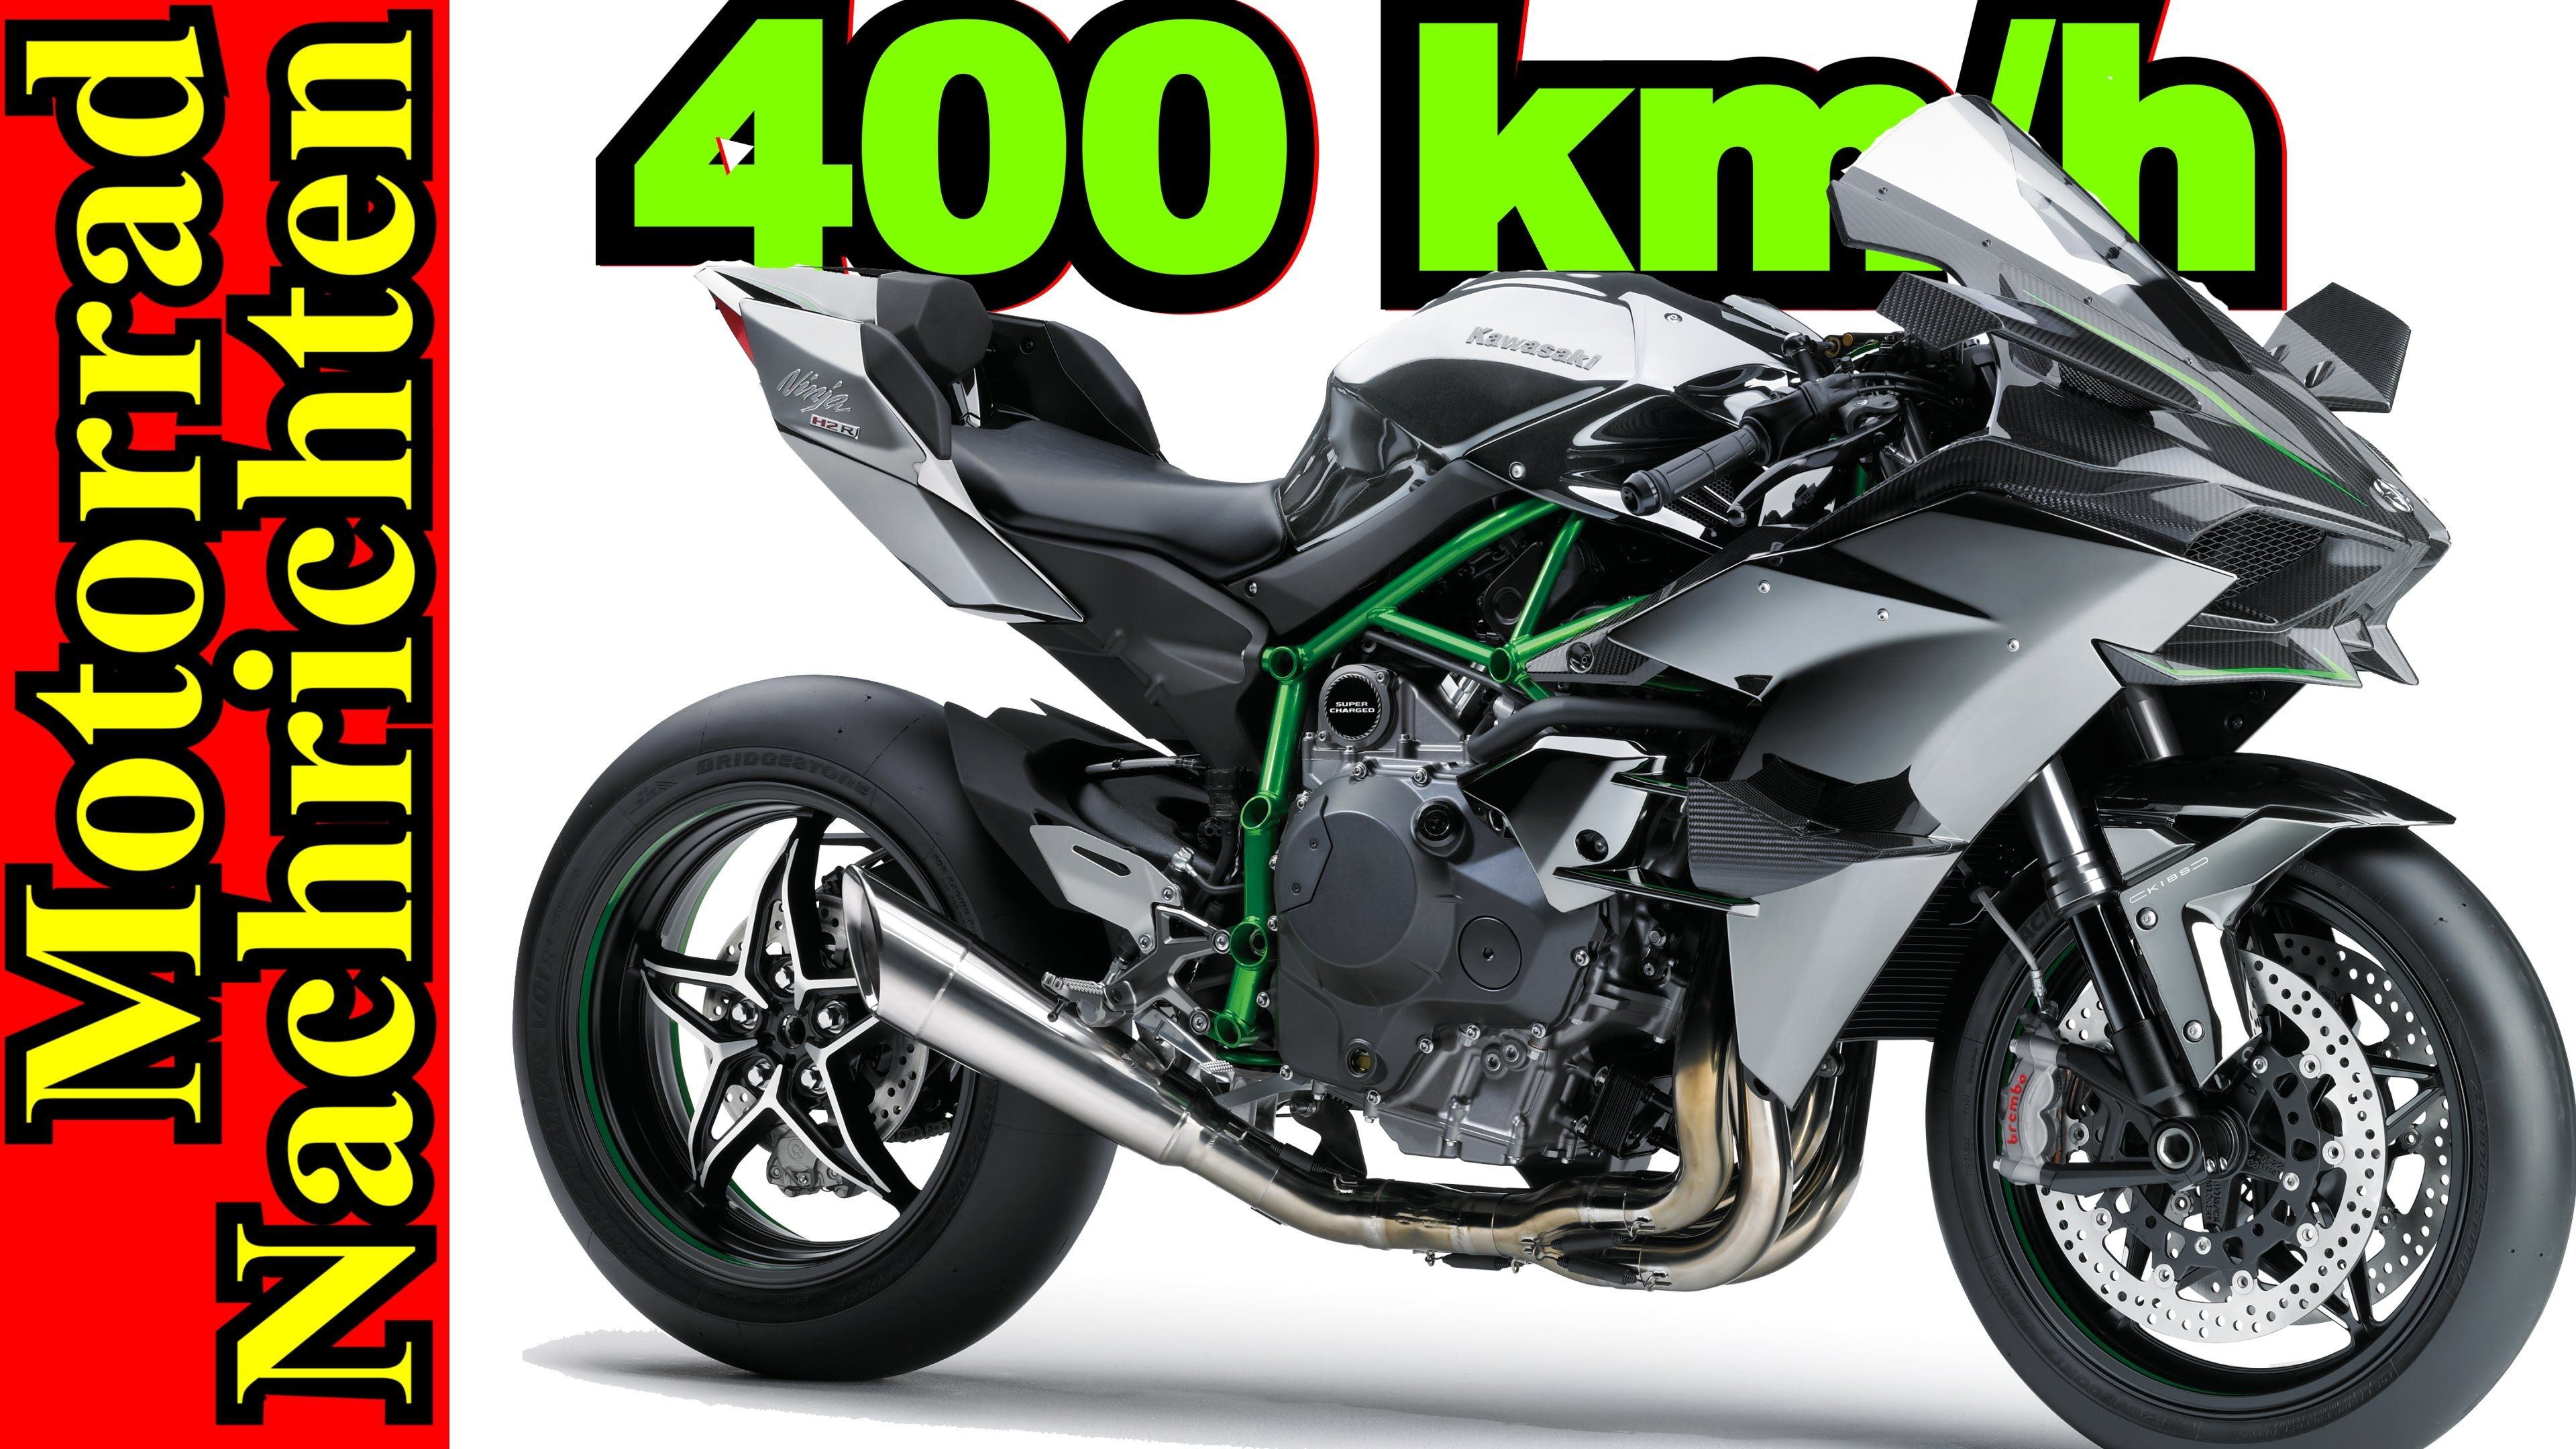 H2R 400 Km H